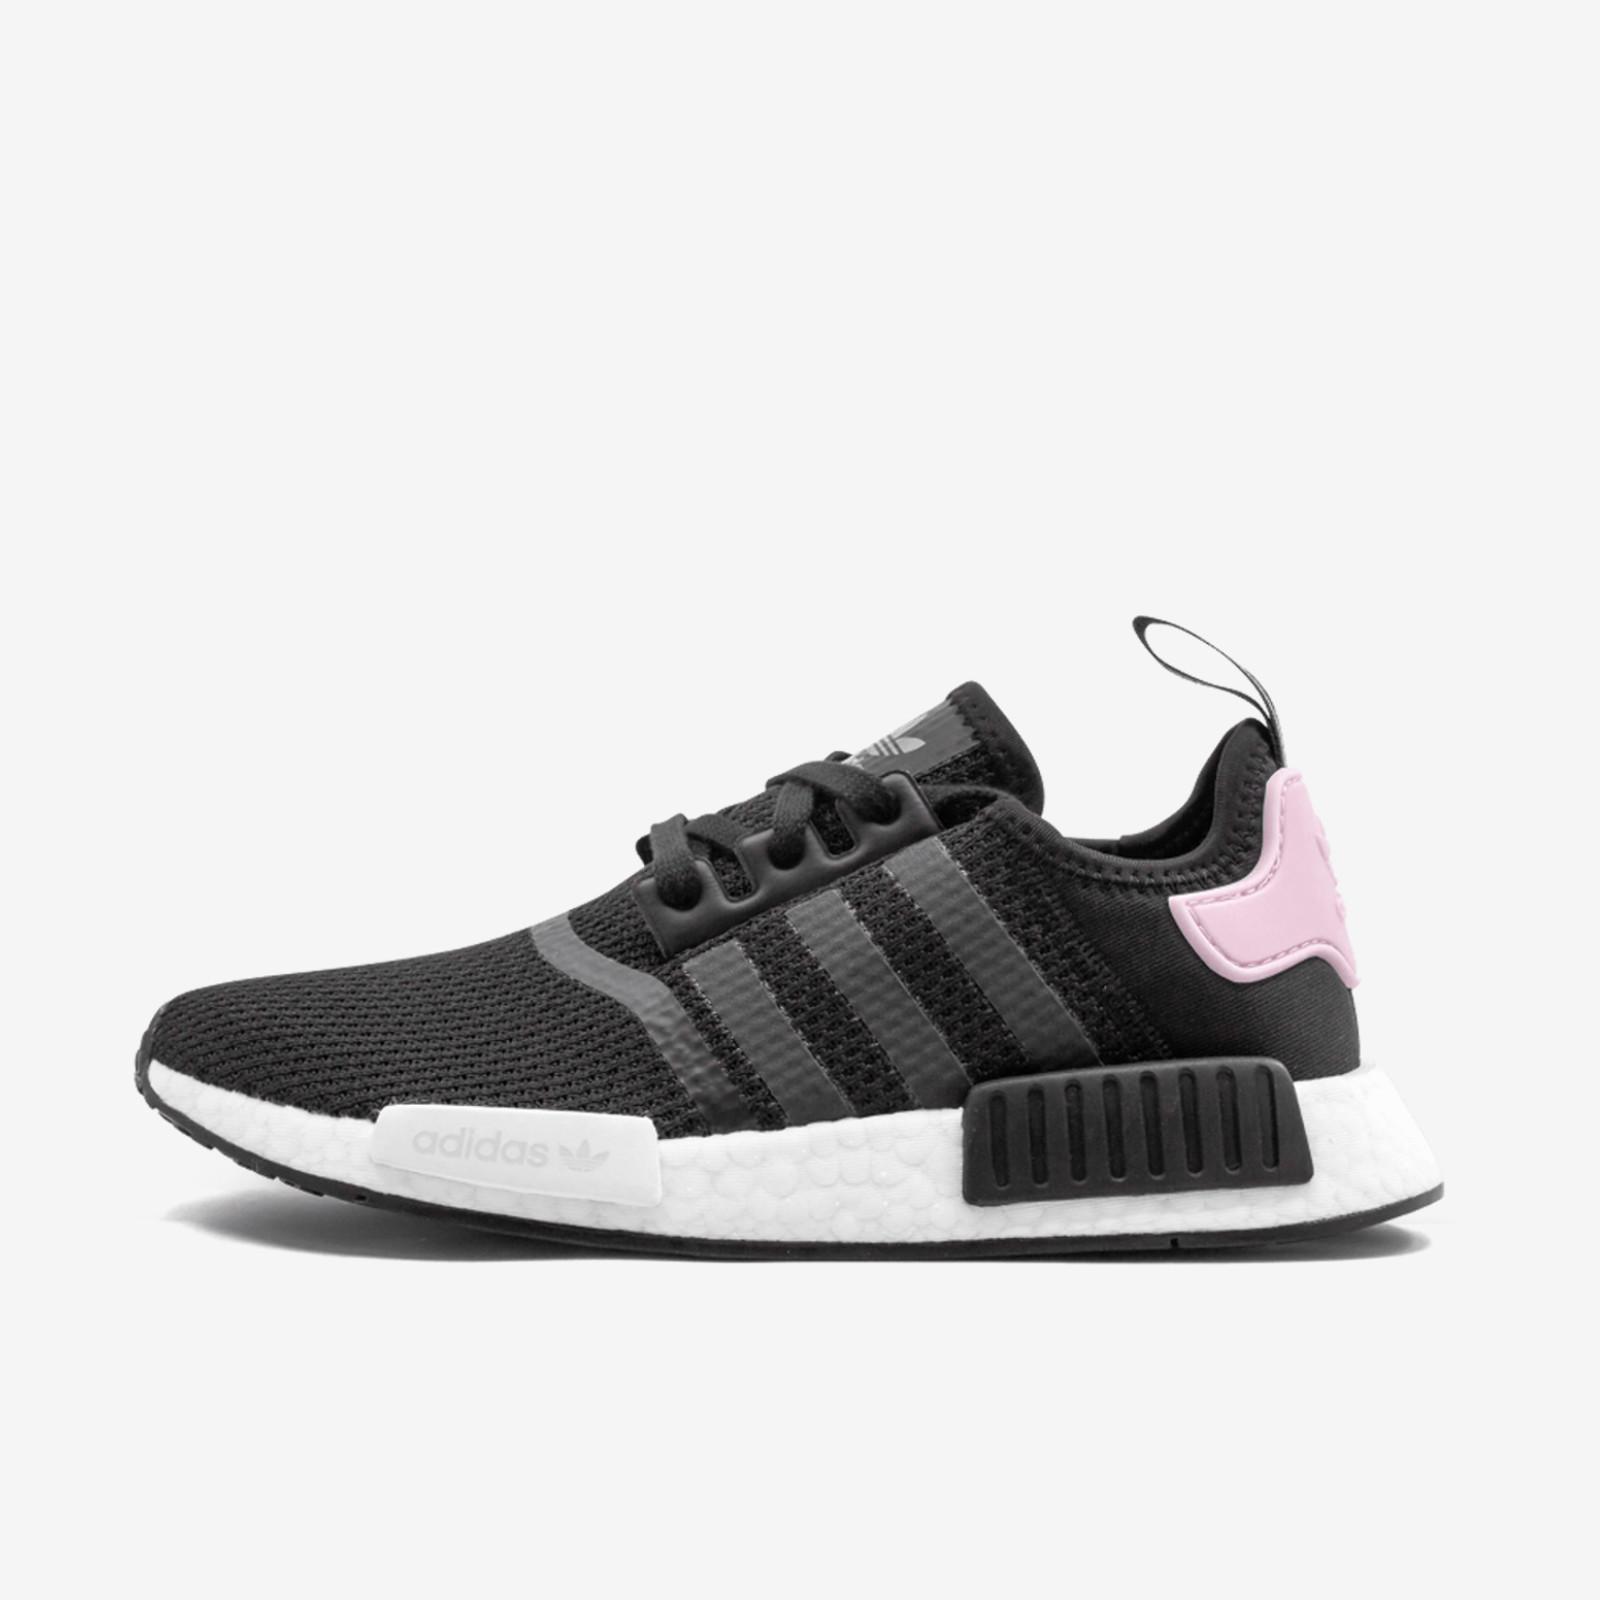 shoes, adidas nmd, adidas, adidas shoes, black, pink, white